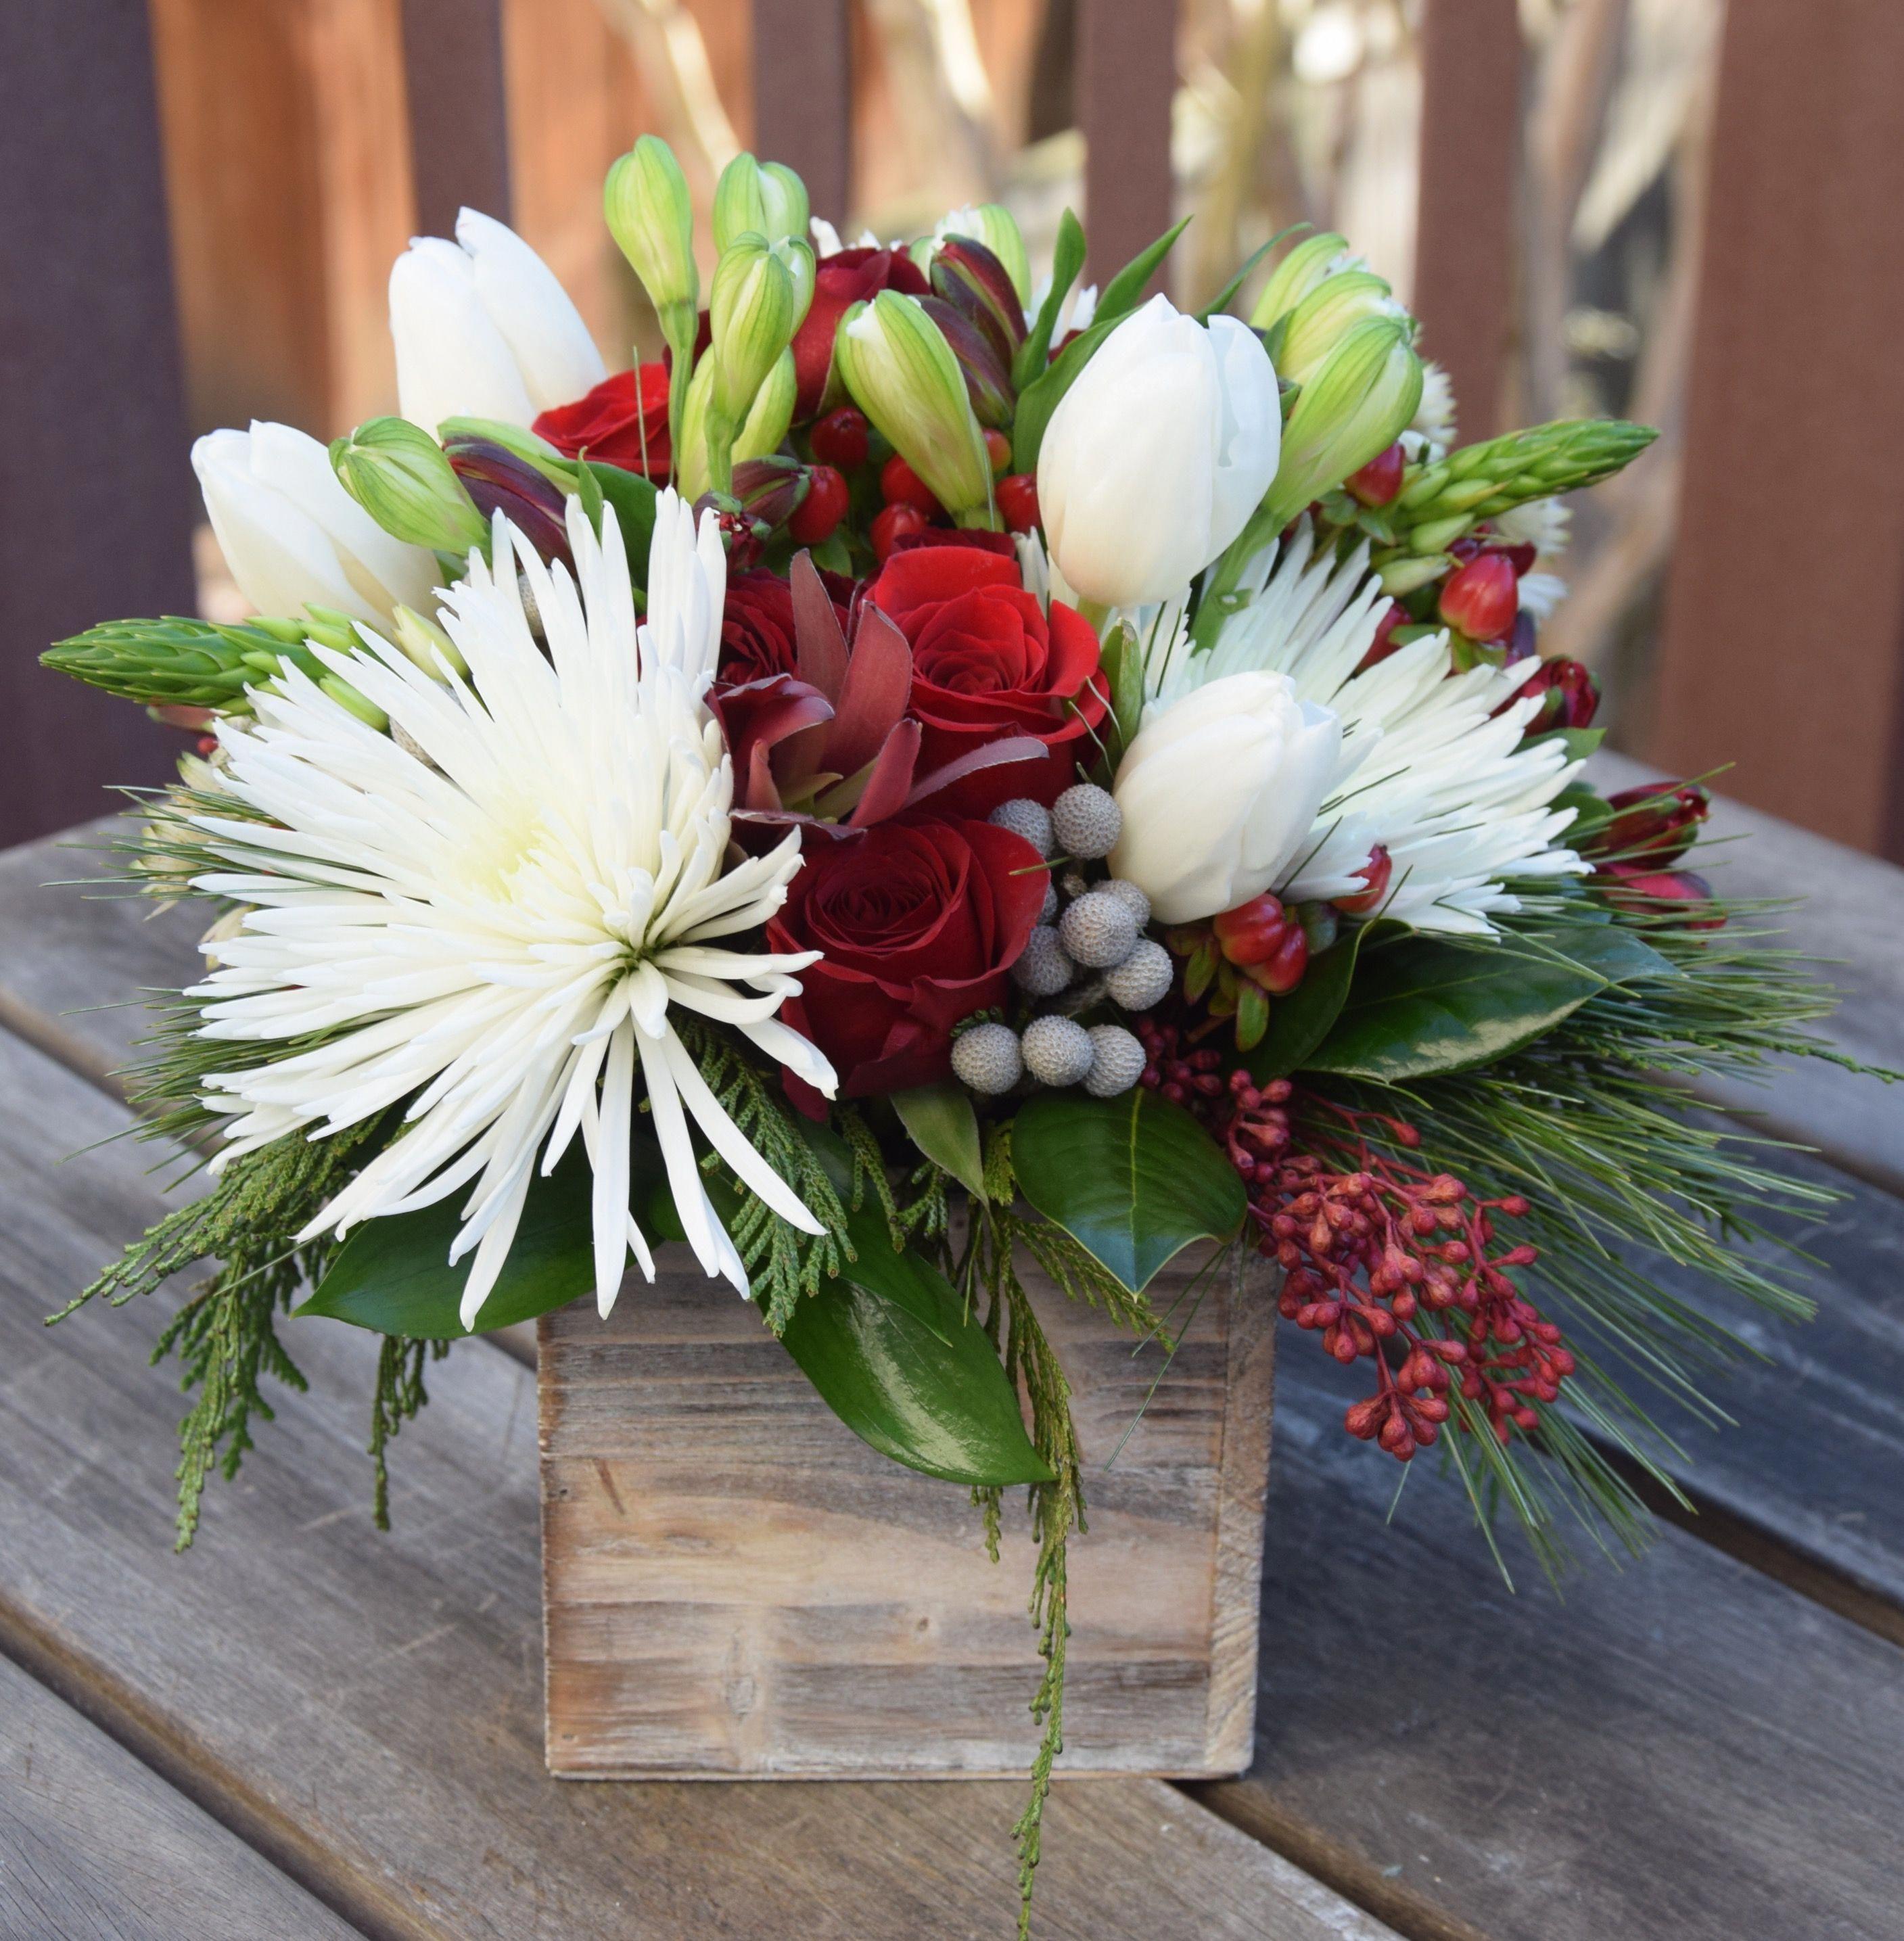 Wedding Flower Arrangements Diy You Can Use Craigslist To Loc